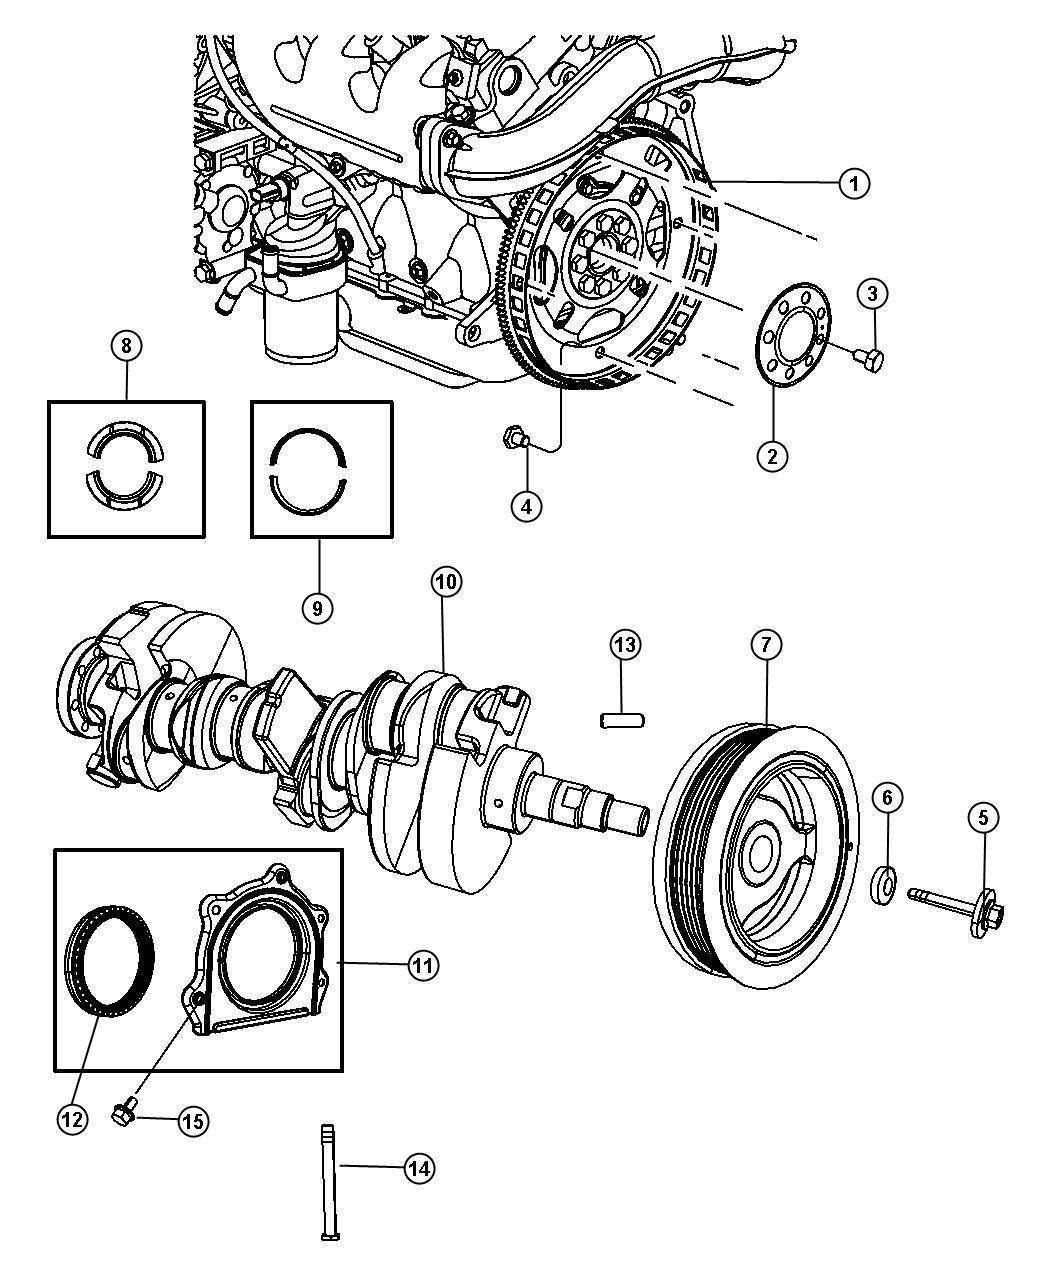 Jeep Wrangler Rubicon 3 8l V6 A T 4x4 Bolt Screw